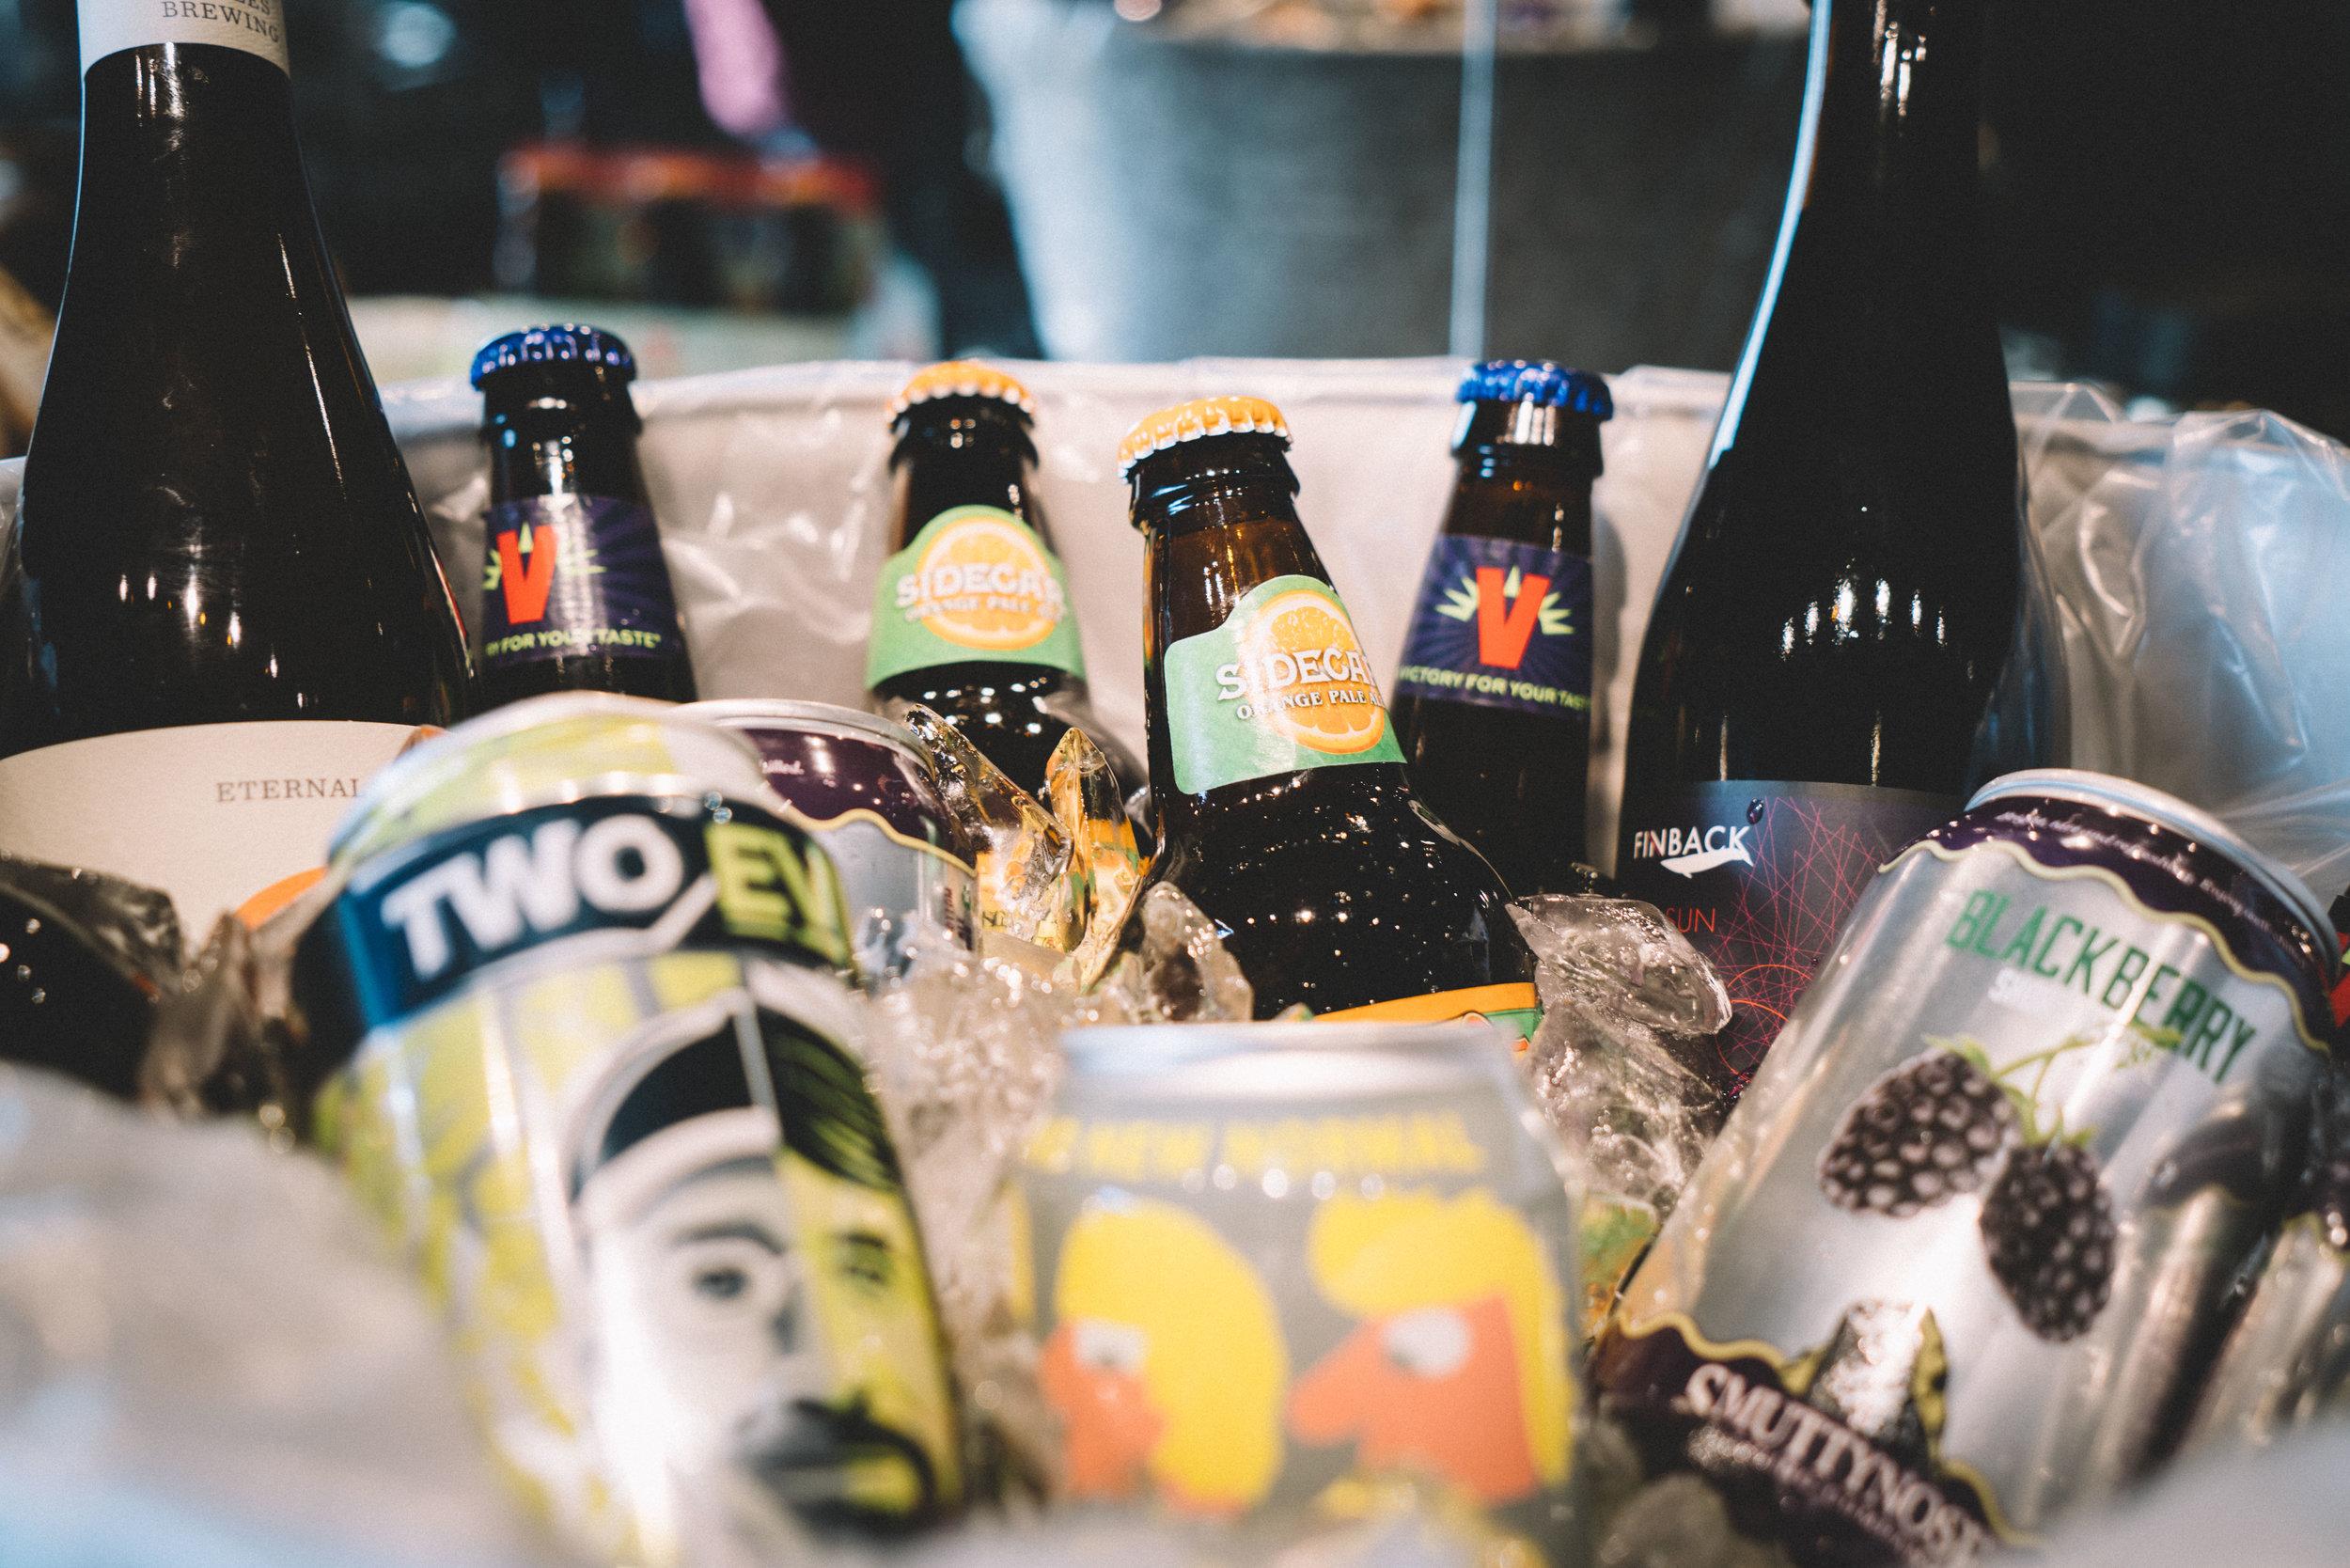 BeerClub-10.jpg